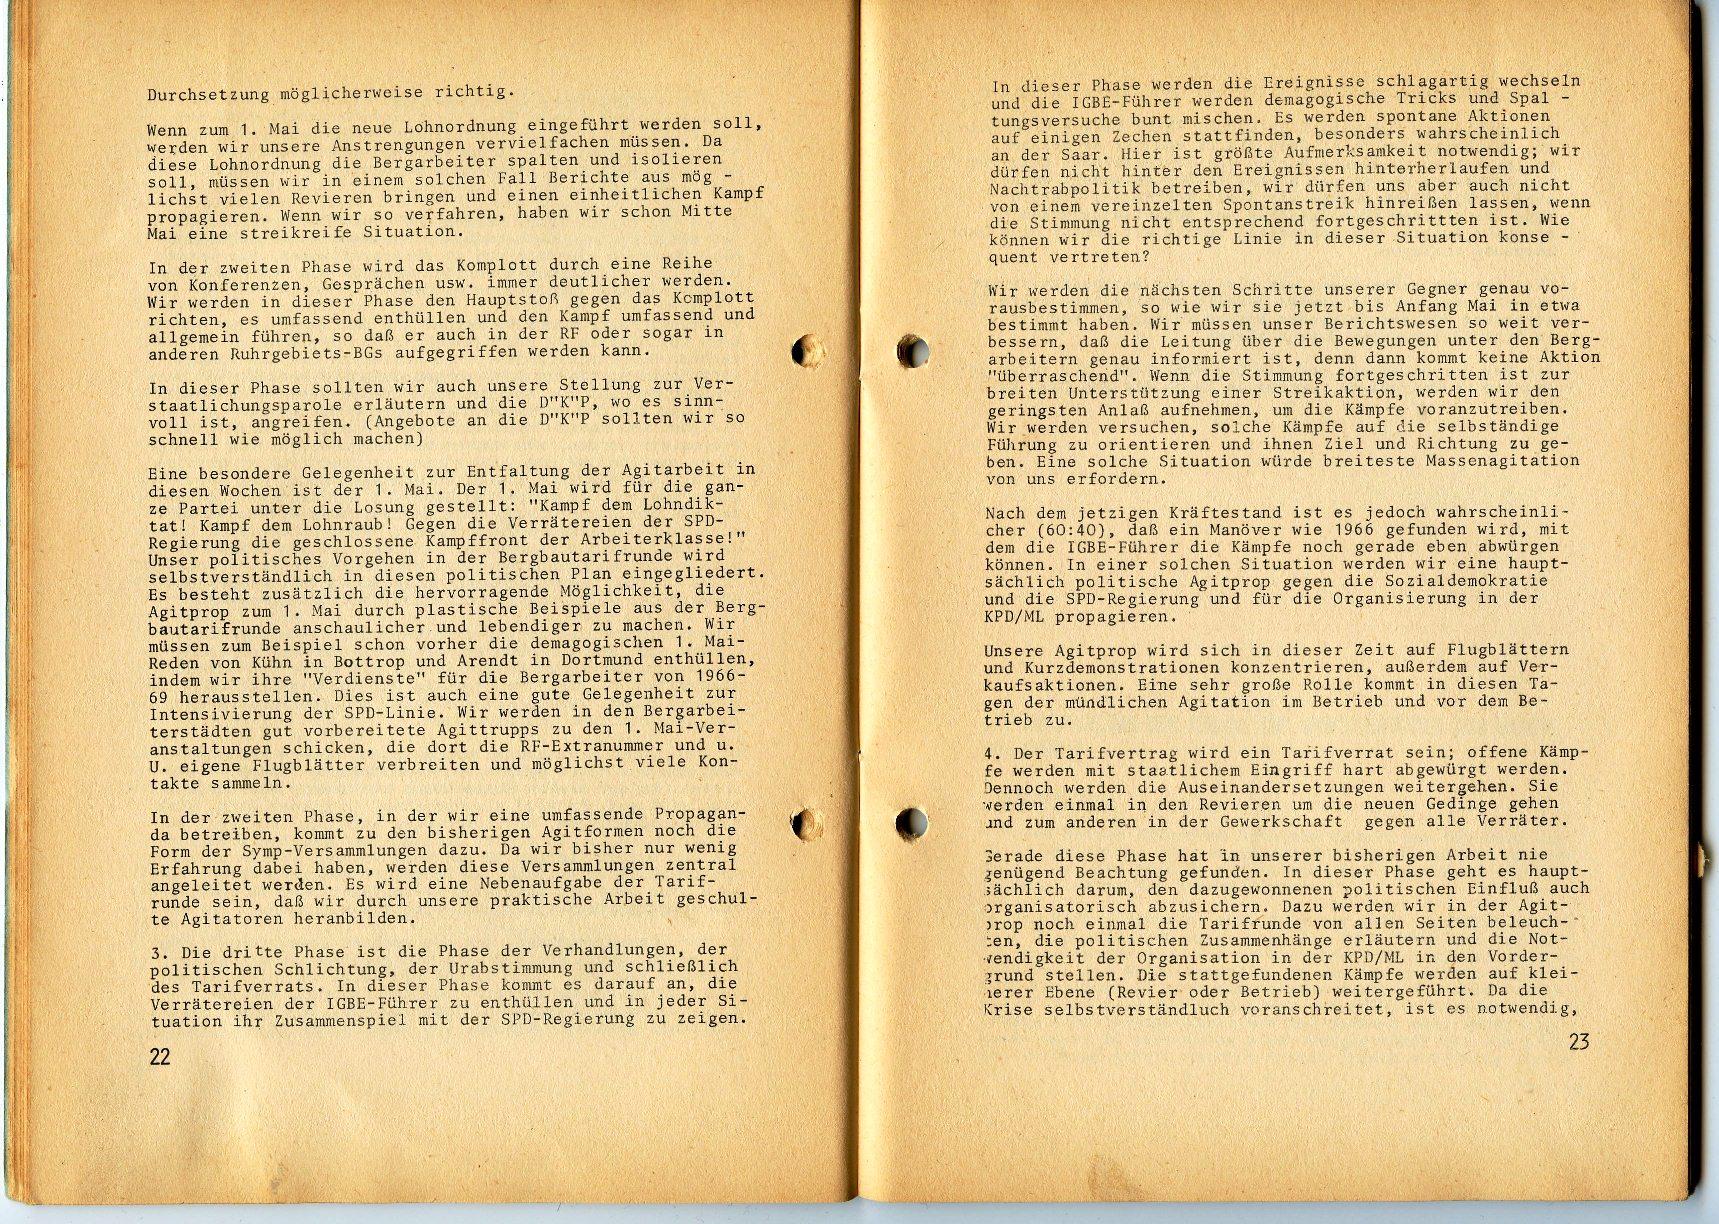 ZB_Parteiarbeiter_1971_04_12